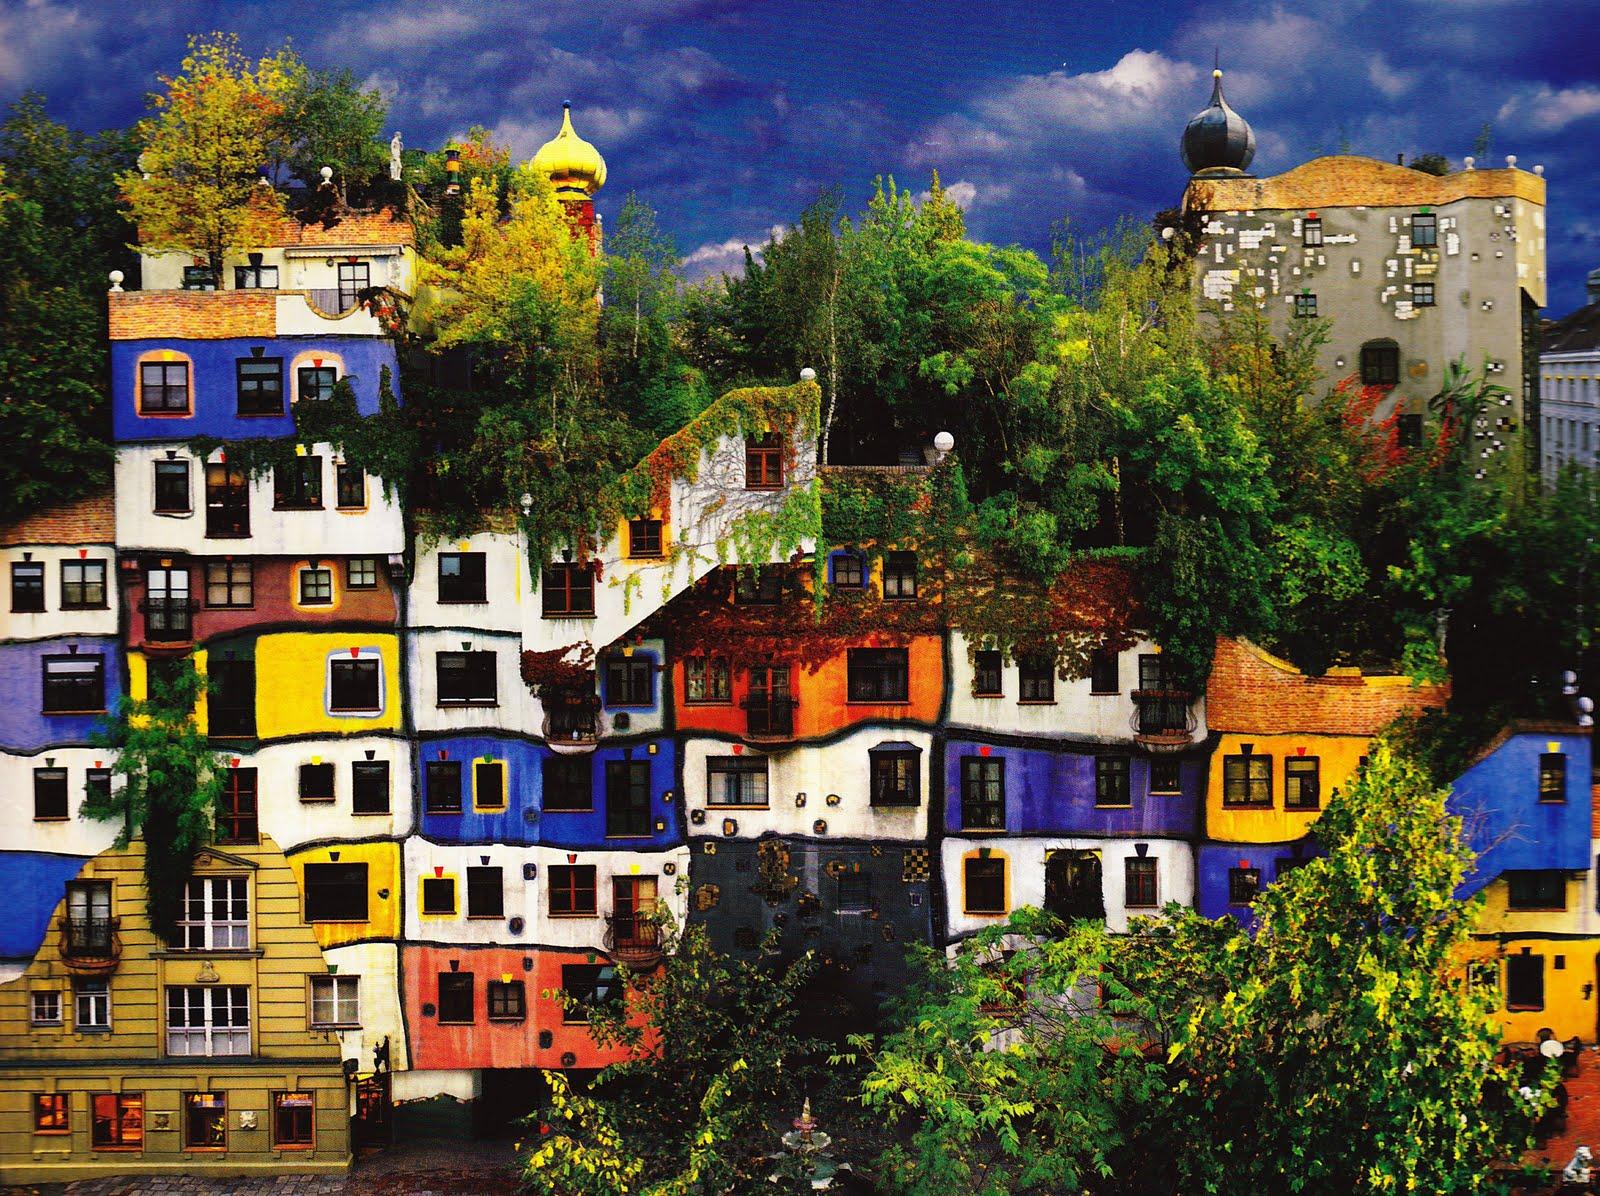 維也納百水公寓 Hundertwasserhaus – Traveladvertiser